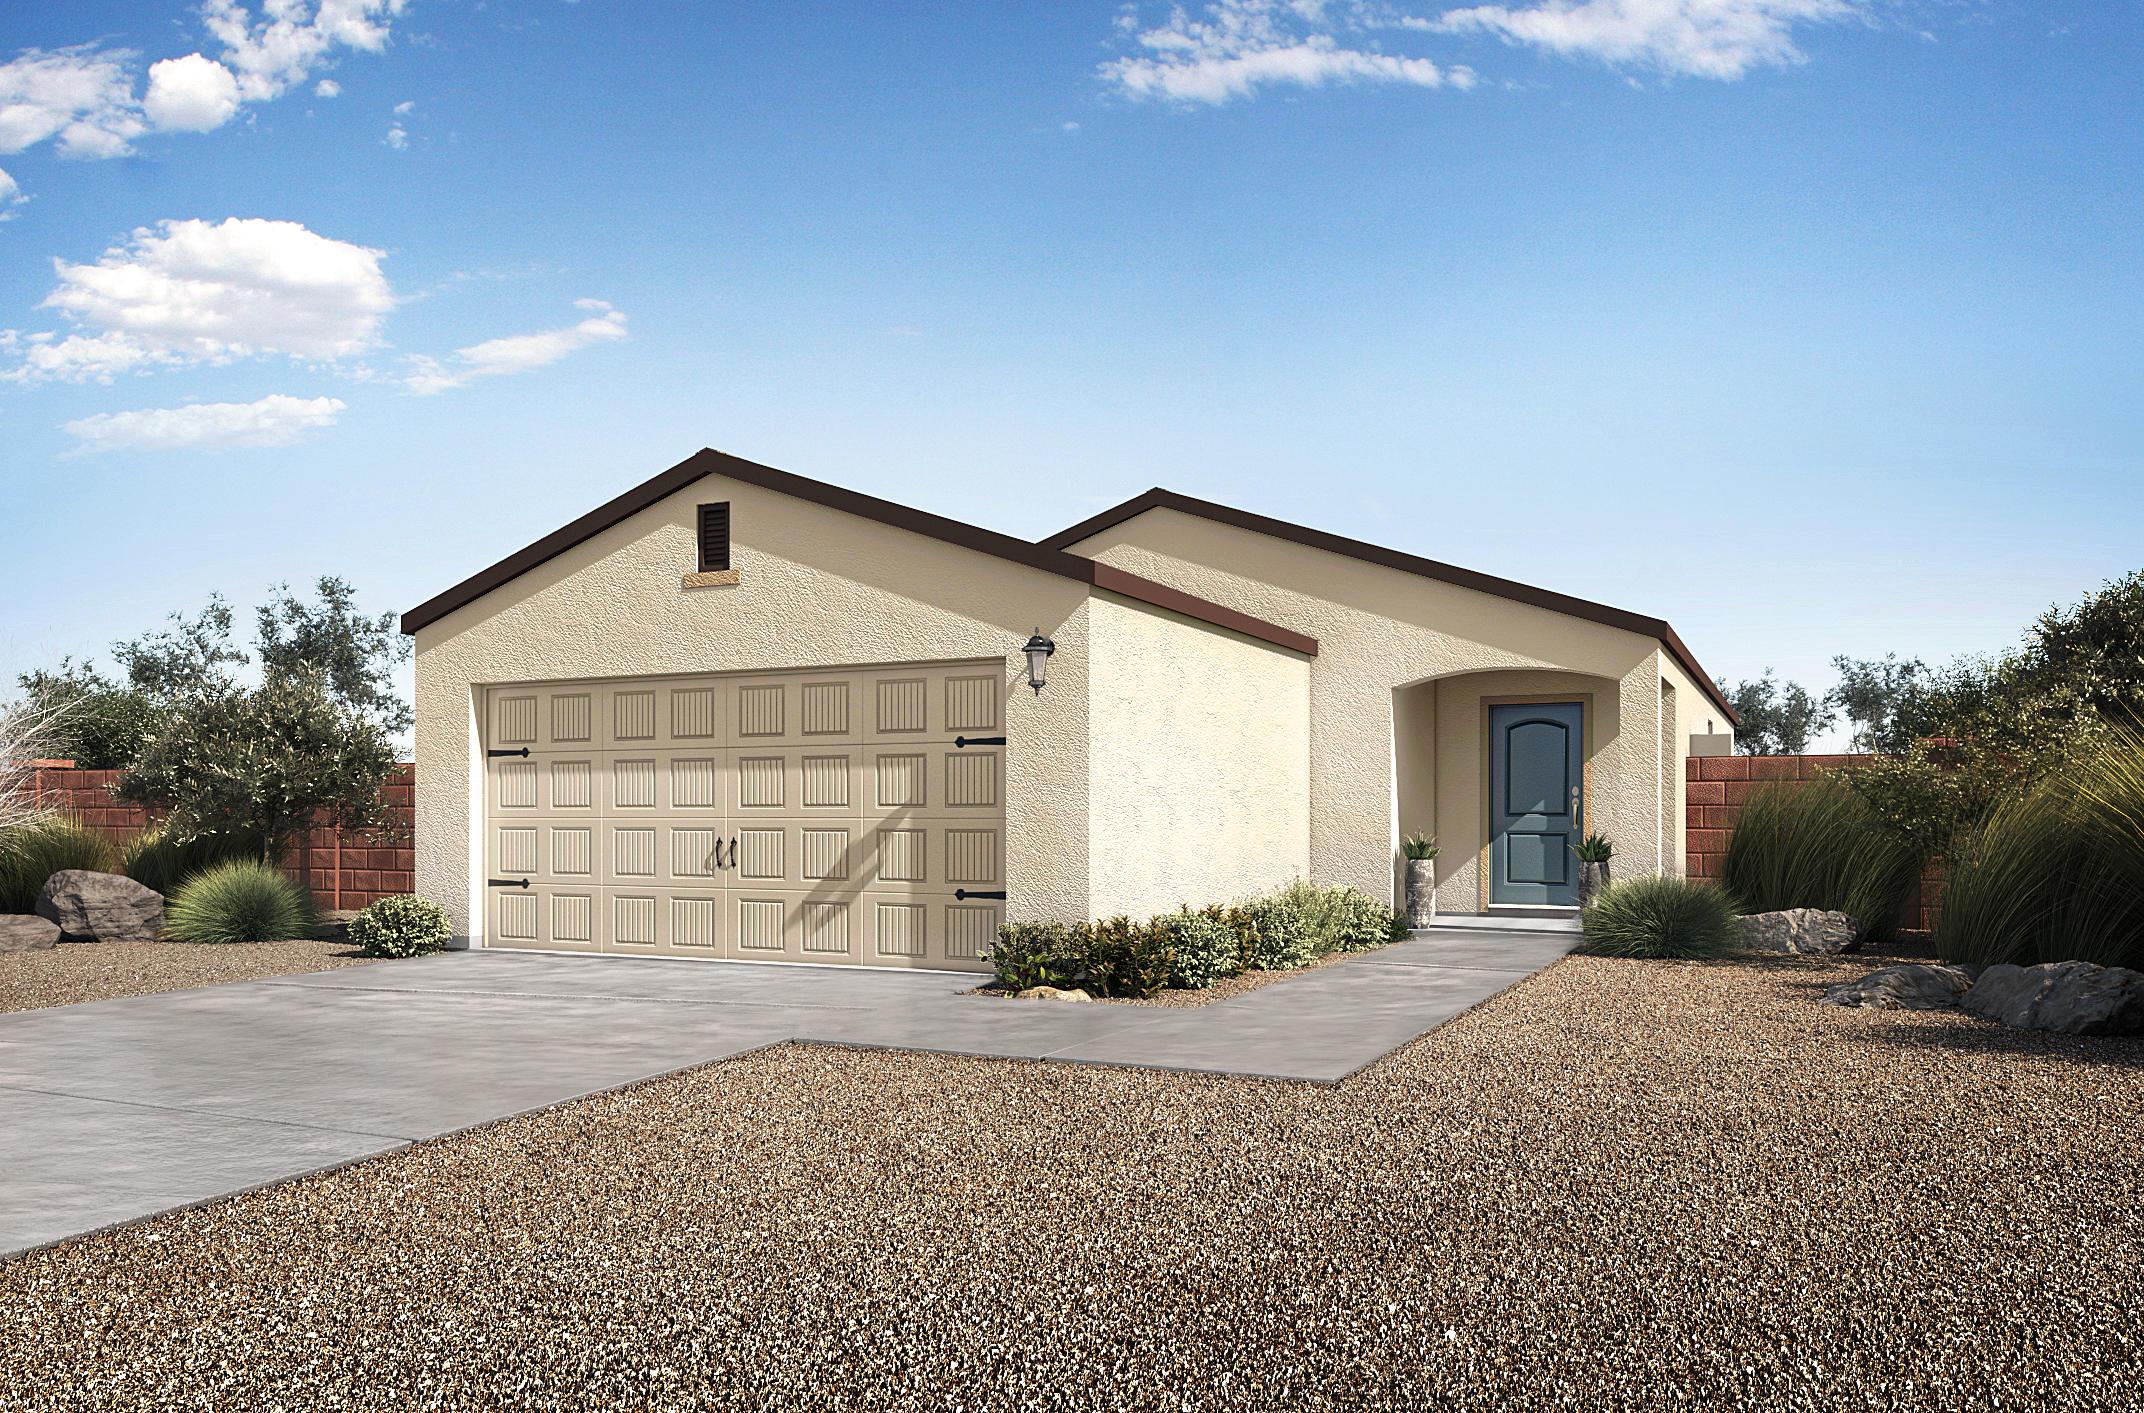 10024 Sacate Blanco Avenue, Albuquerque NM 87121